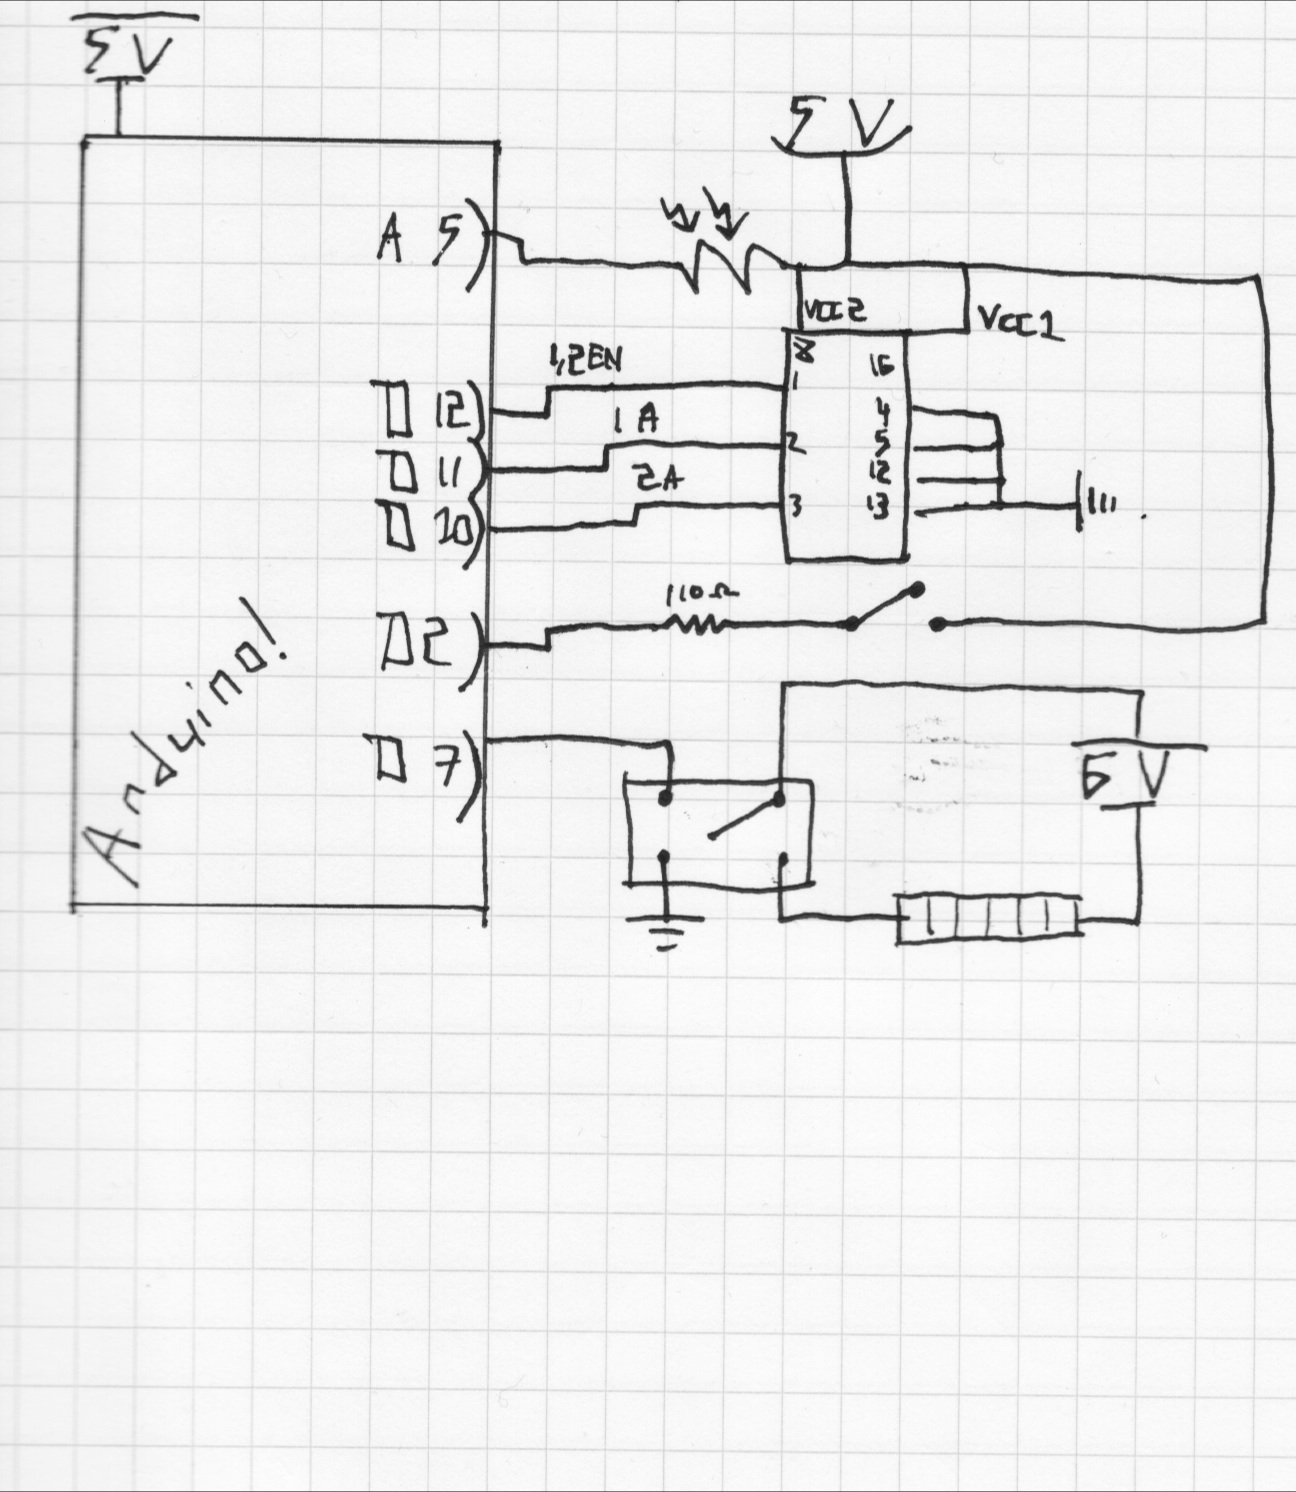 Final Documentation Thermal Printer Thing